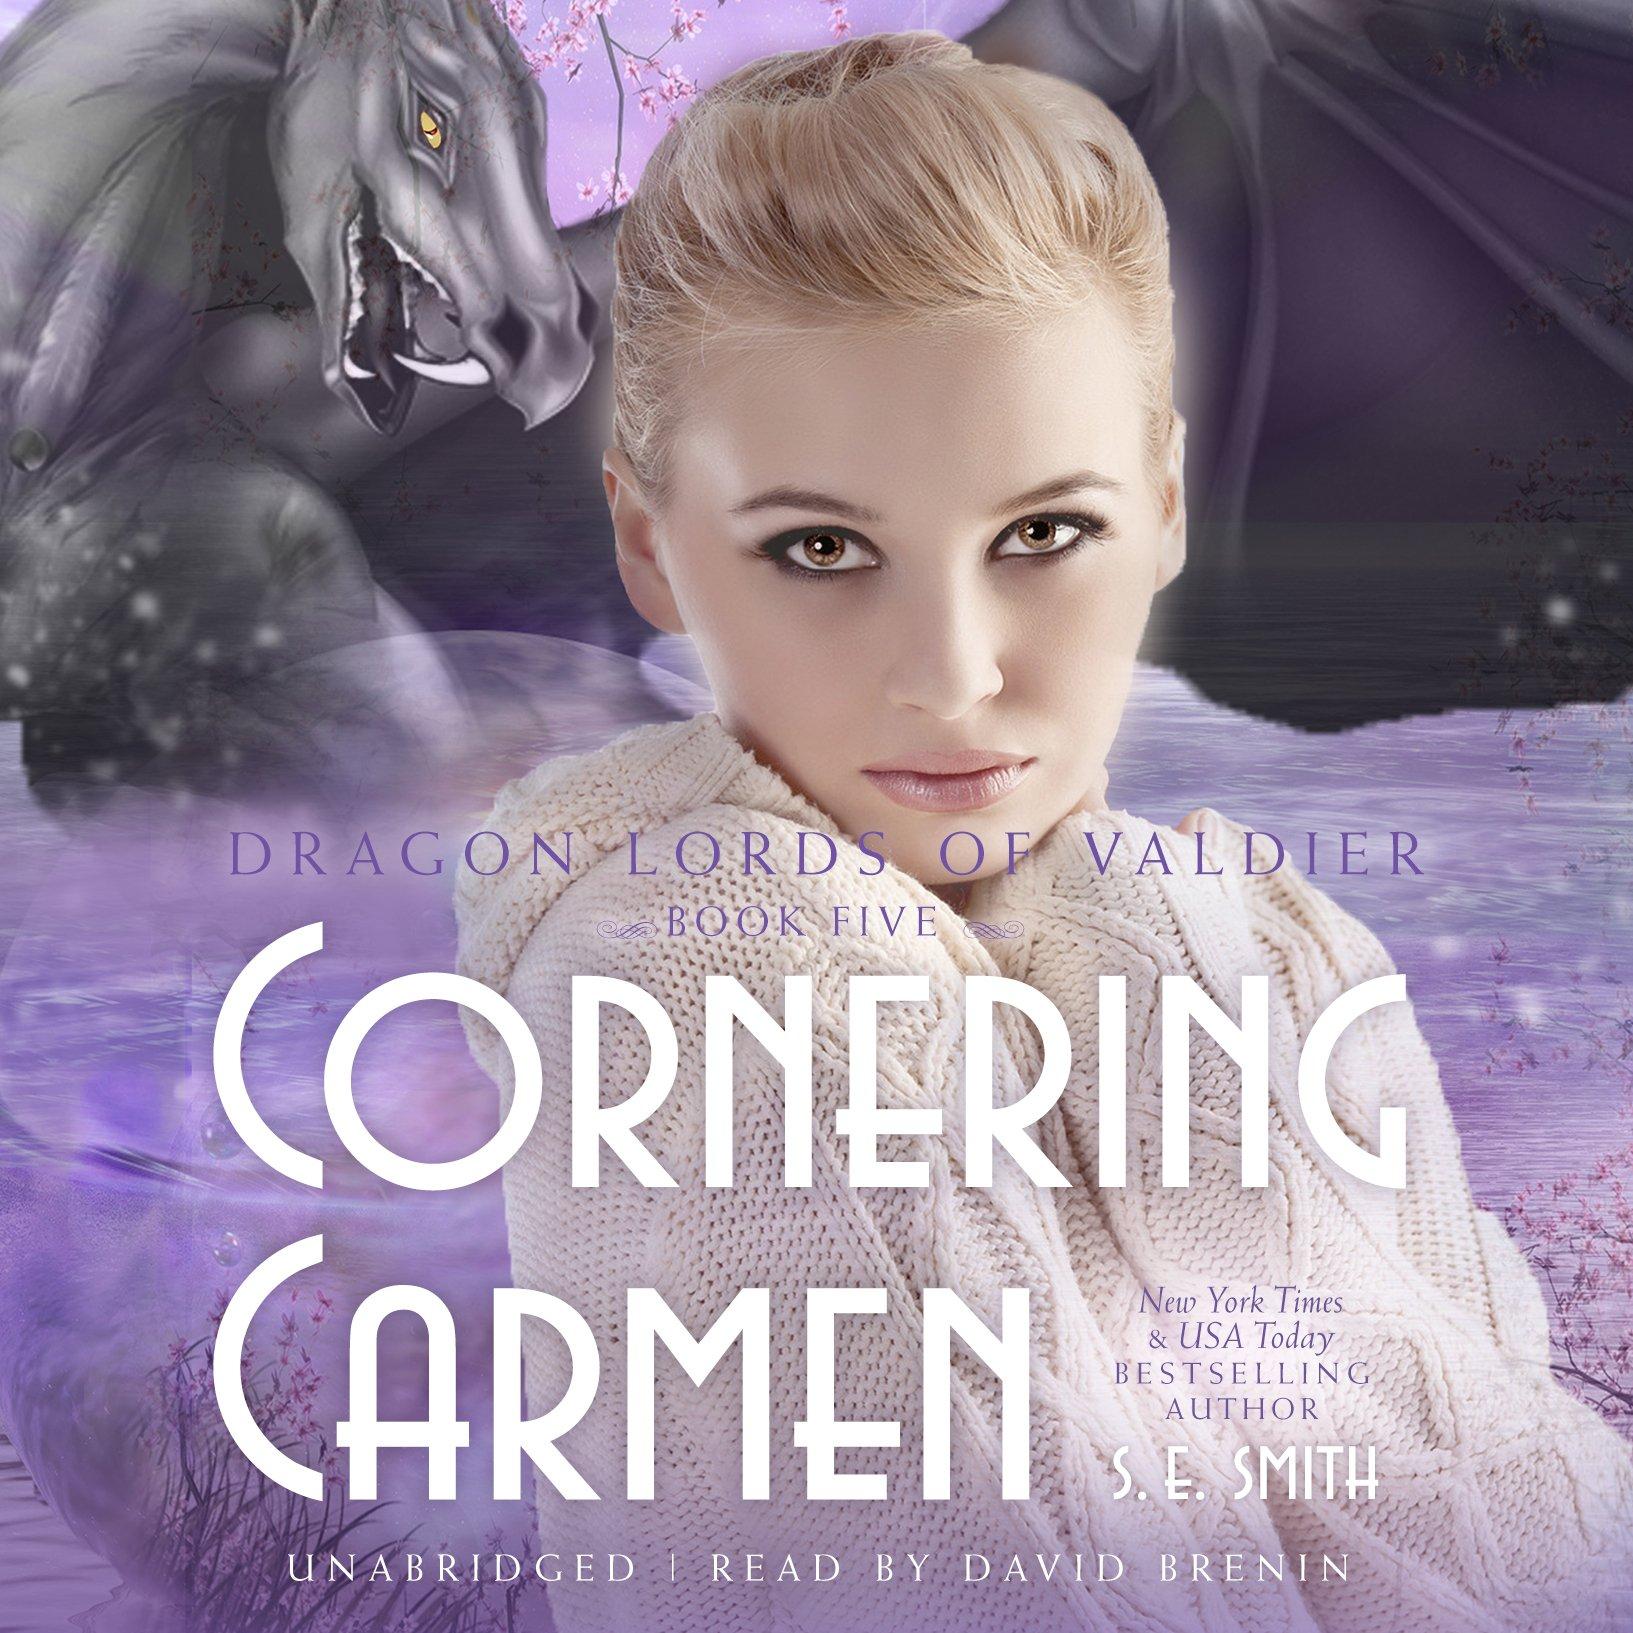 Cornering Carmen (Dragon Lords of Valdier Series, Book 5)